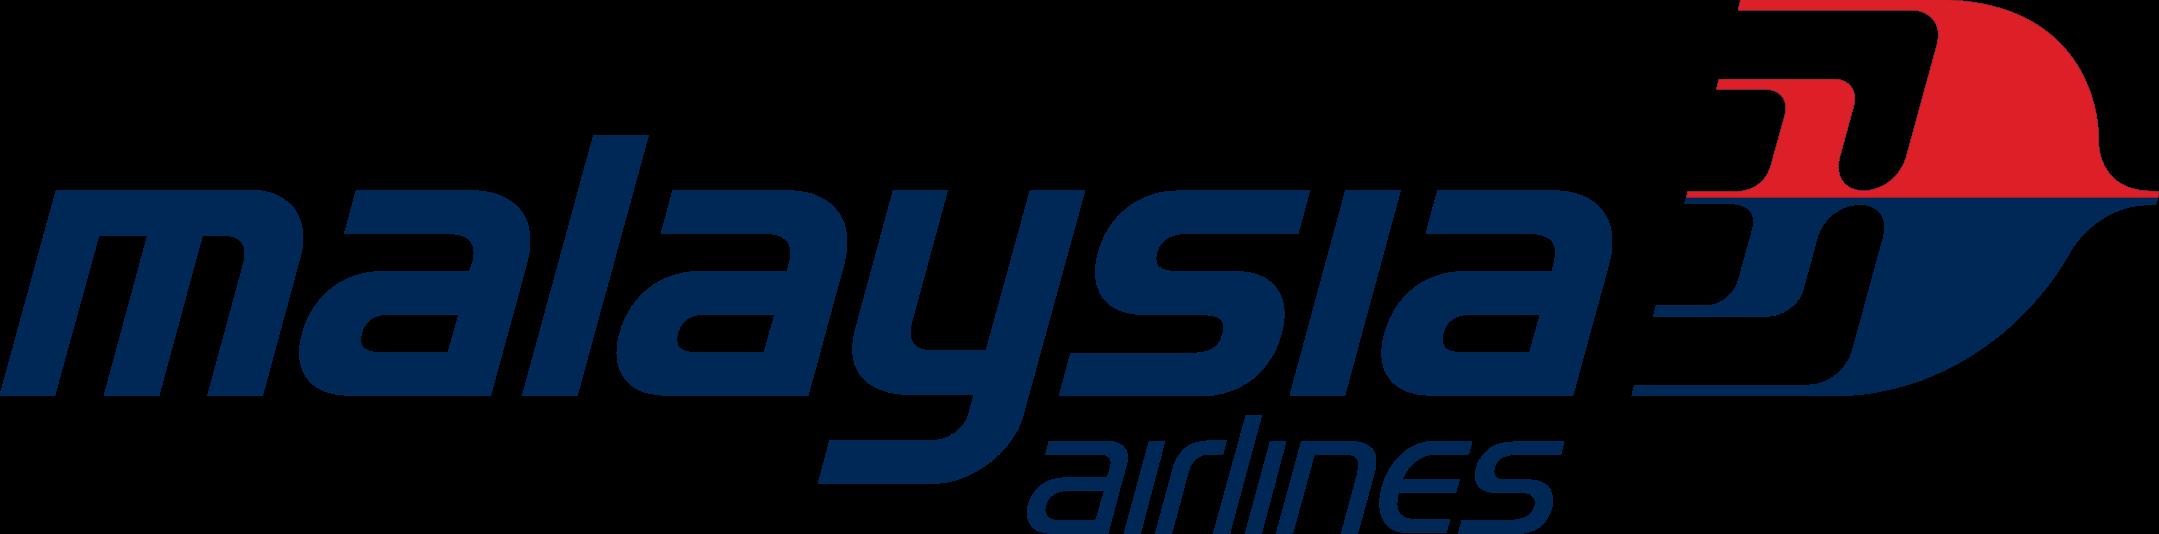 malaysia airlines logo 1 1 - Malaysia Airlines Logo